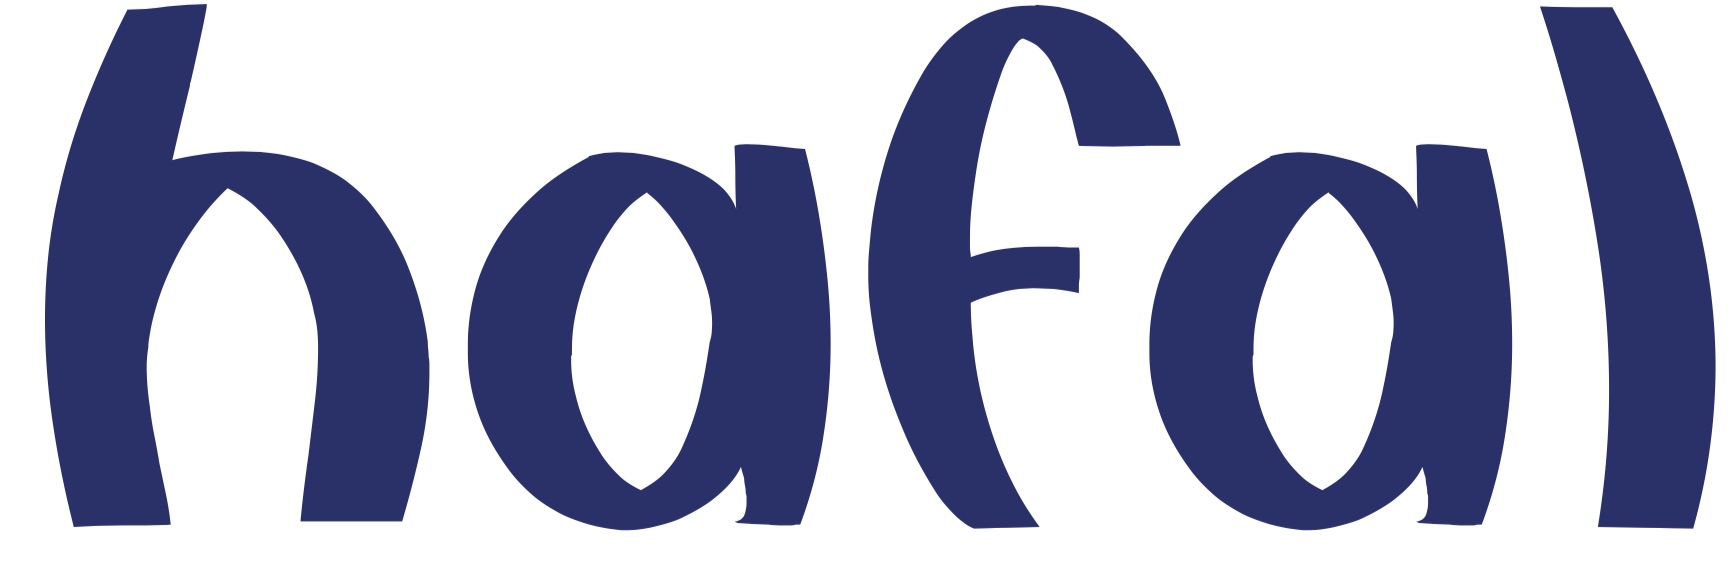 Hafal Logo